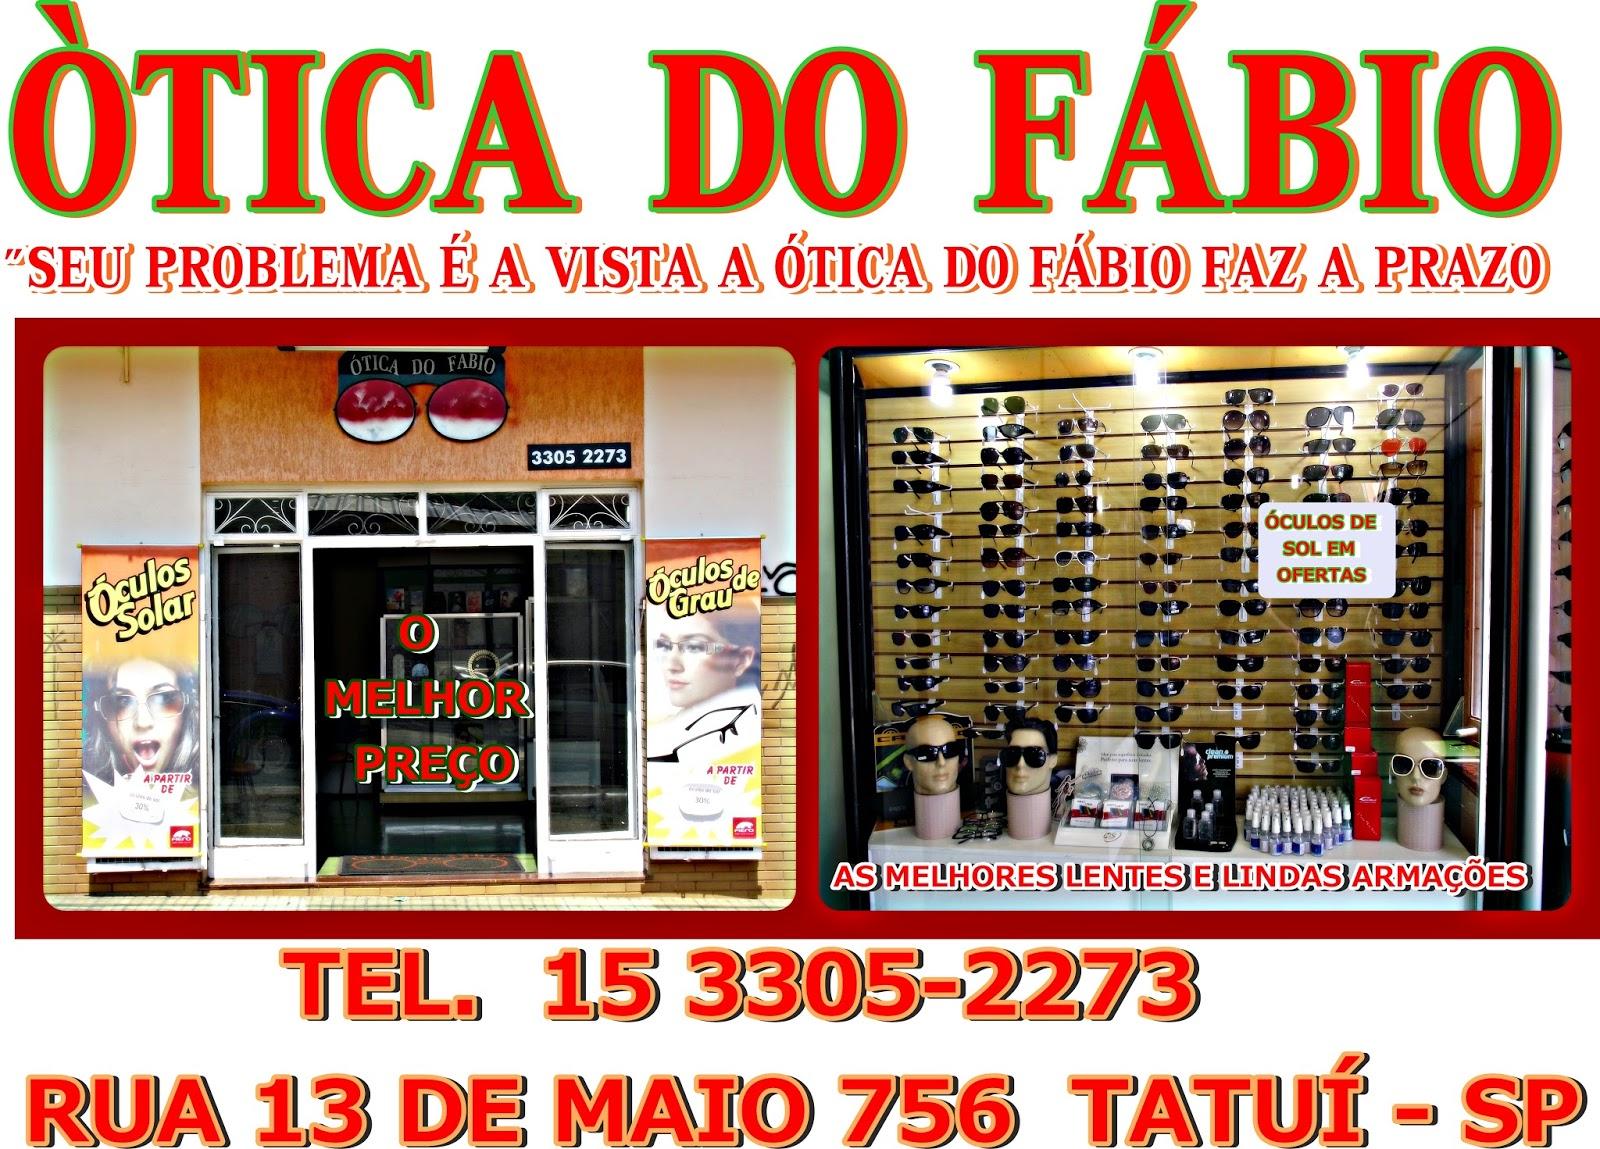 ÓTICA DO FÁBIO TATUÍ ~ MEGA RÁDIO GOSPEL 3d36094070